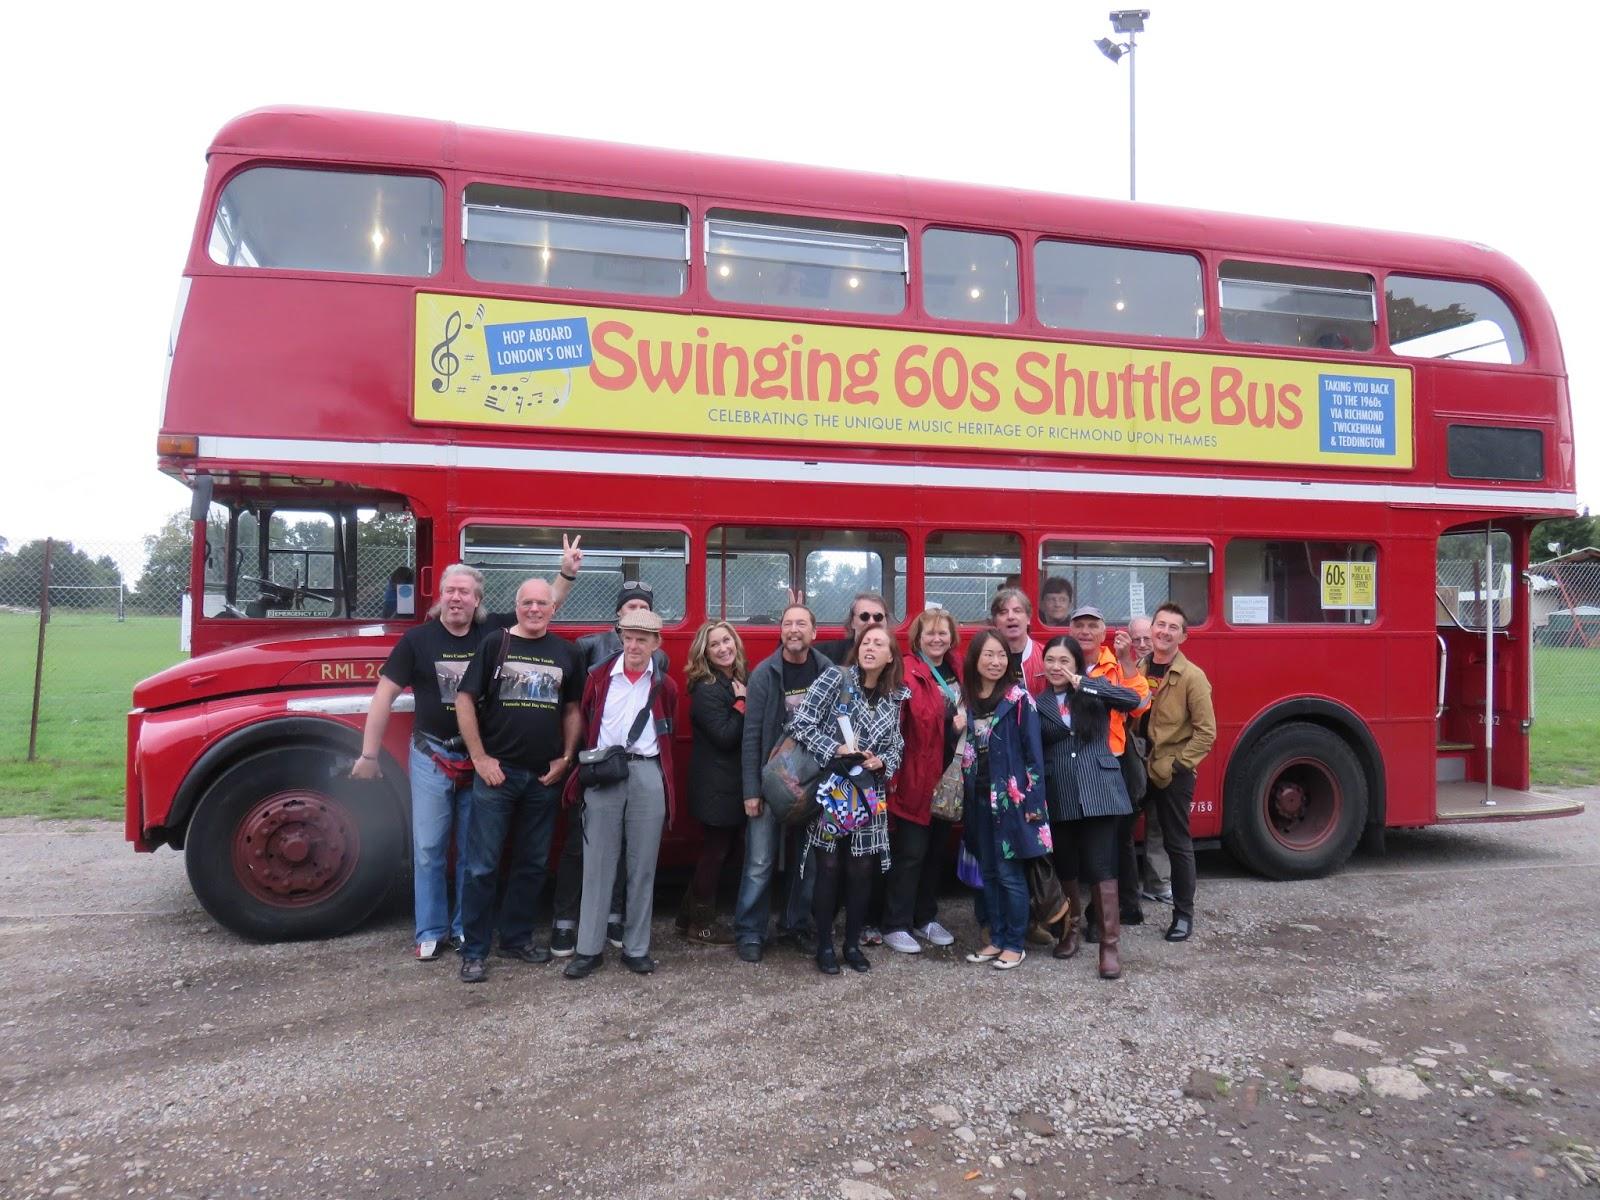 British Beatles Fan Club: Review: Swinging 60s Shuttle Bus